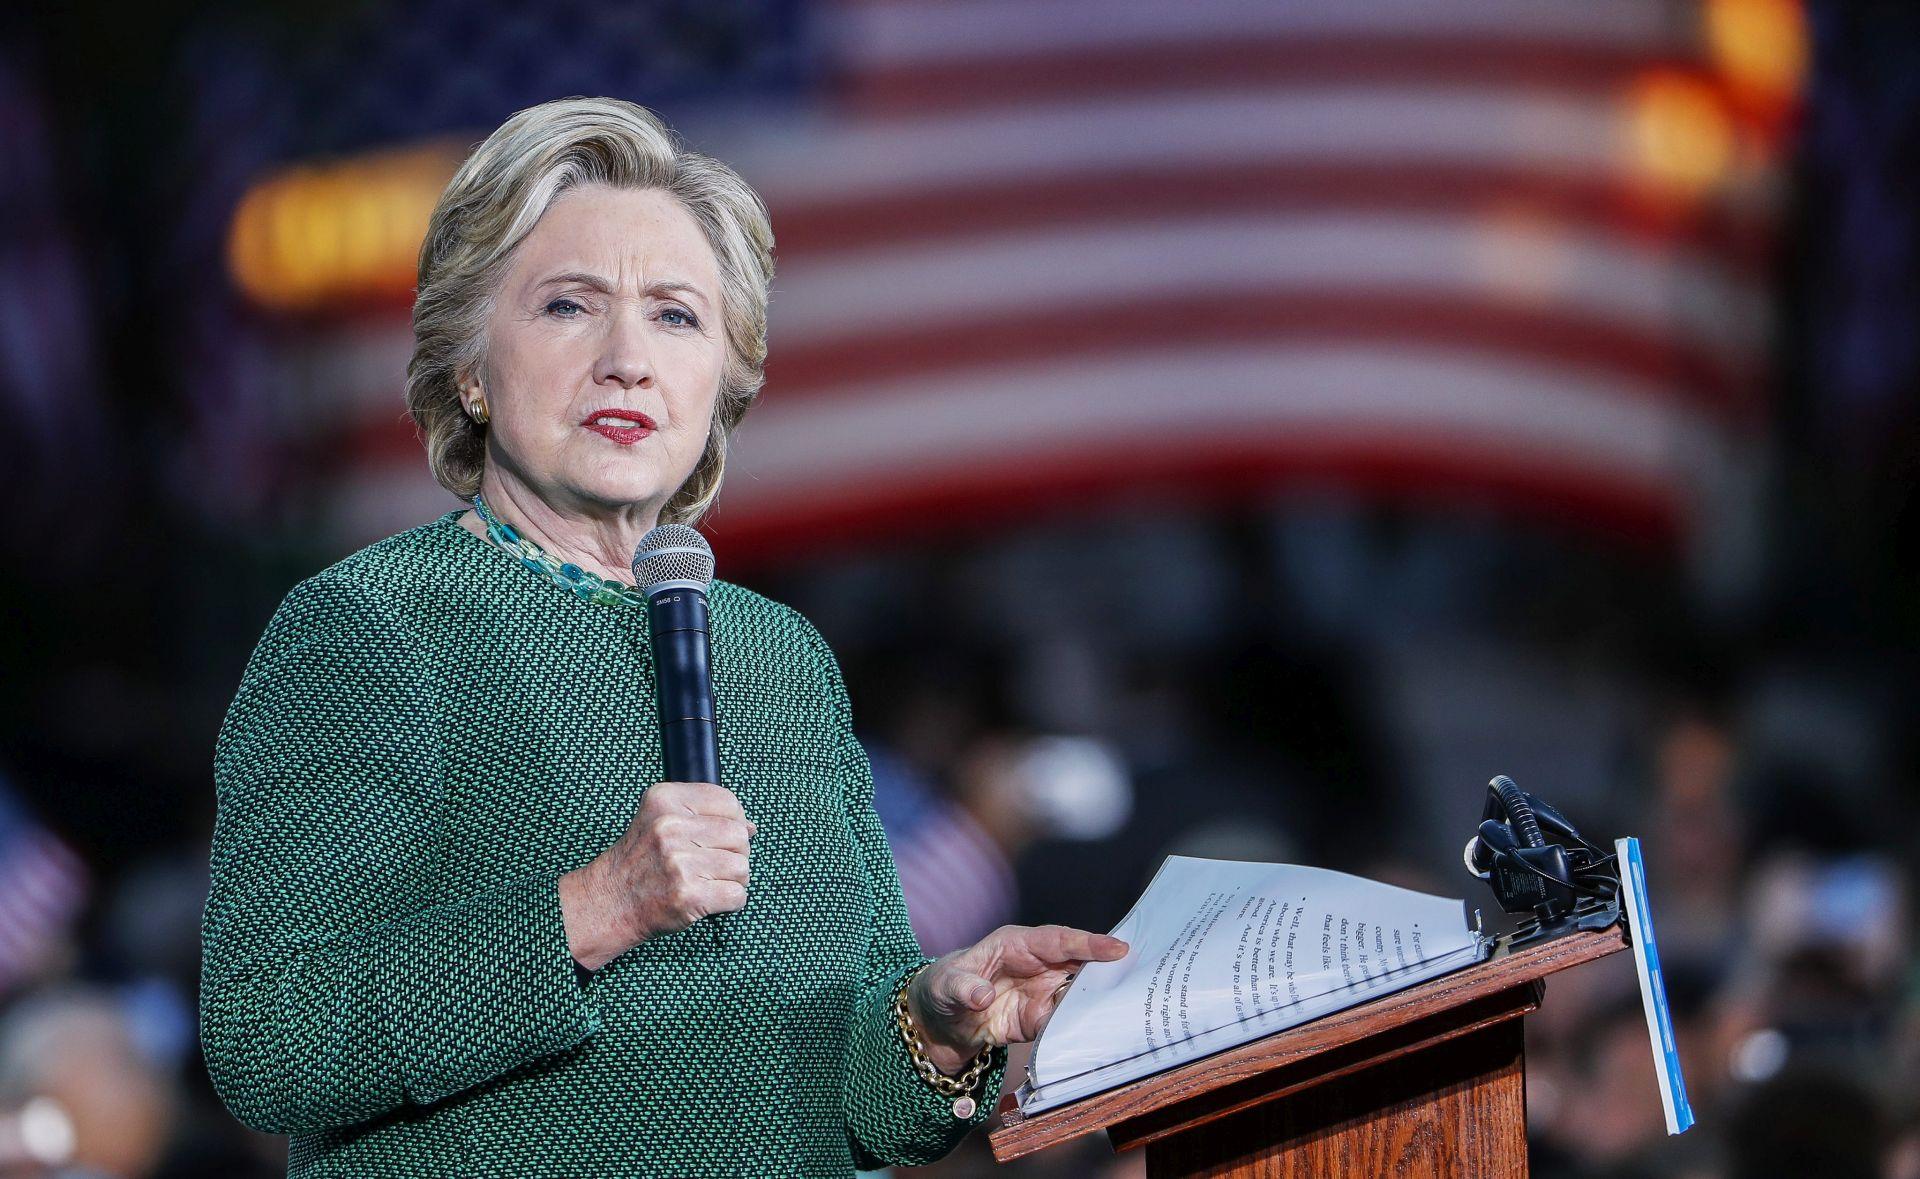 Prednost Clinton se topi dok FBI istražuje e-mailove